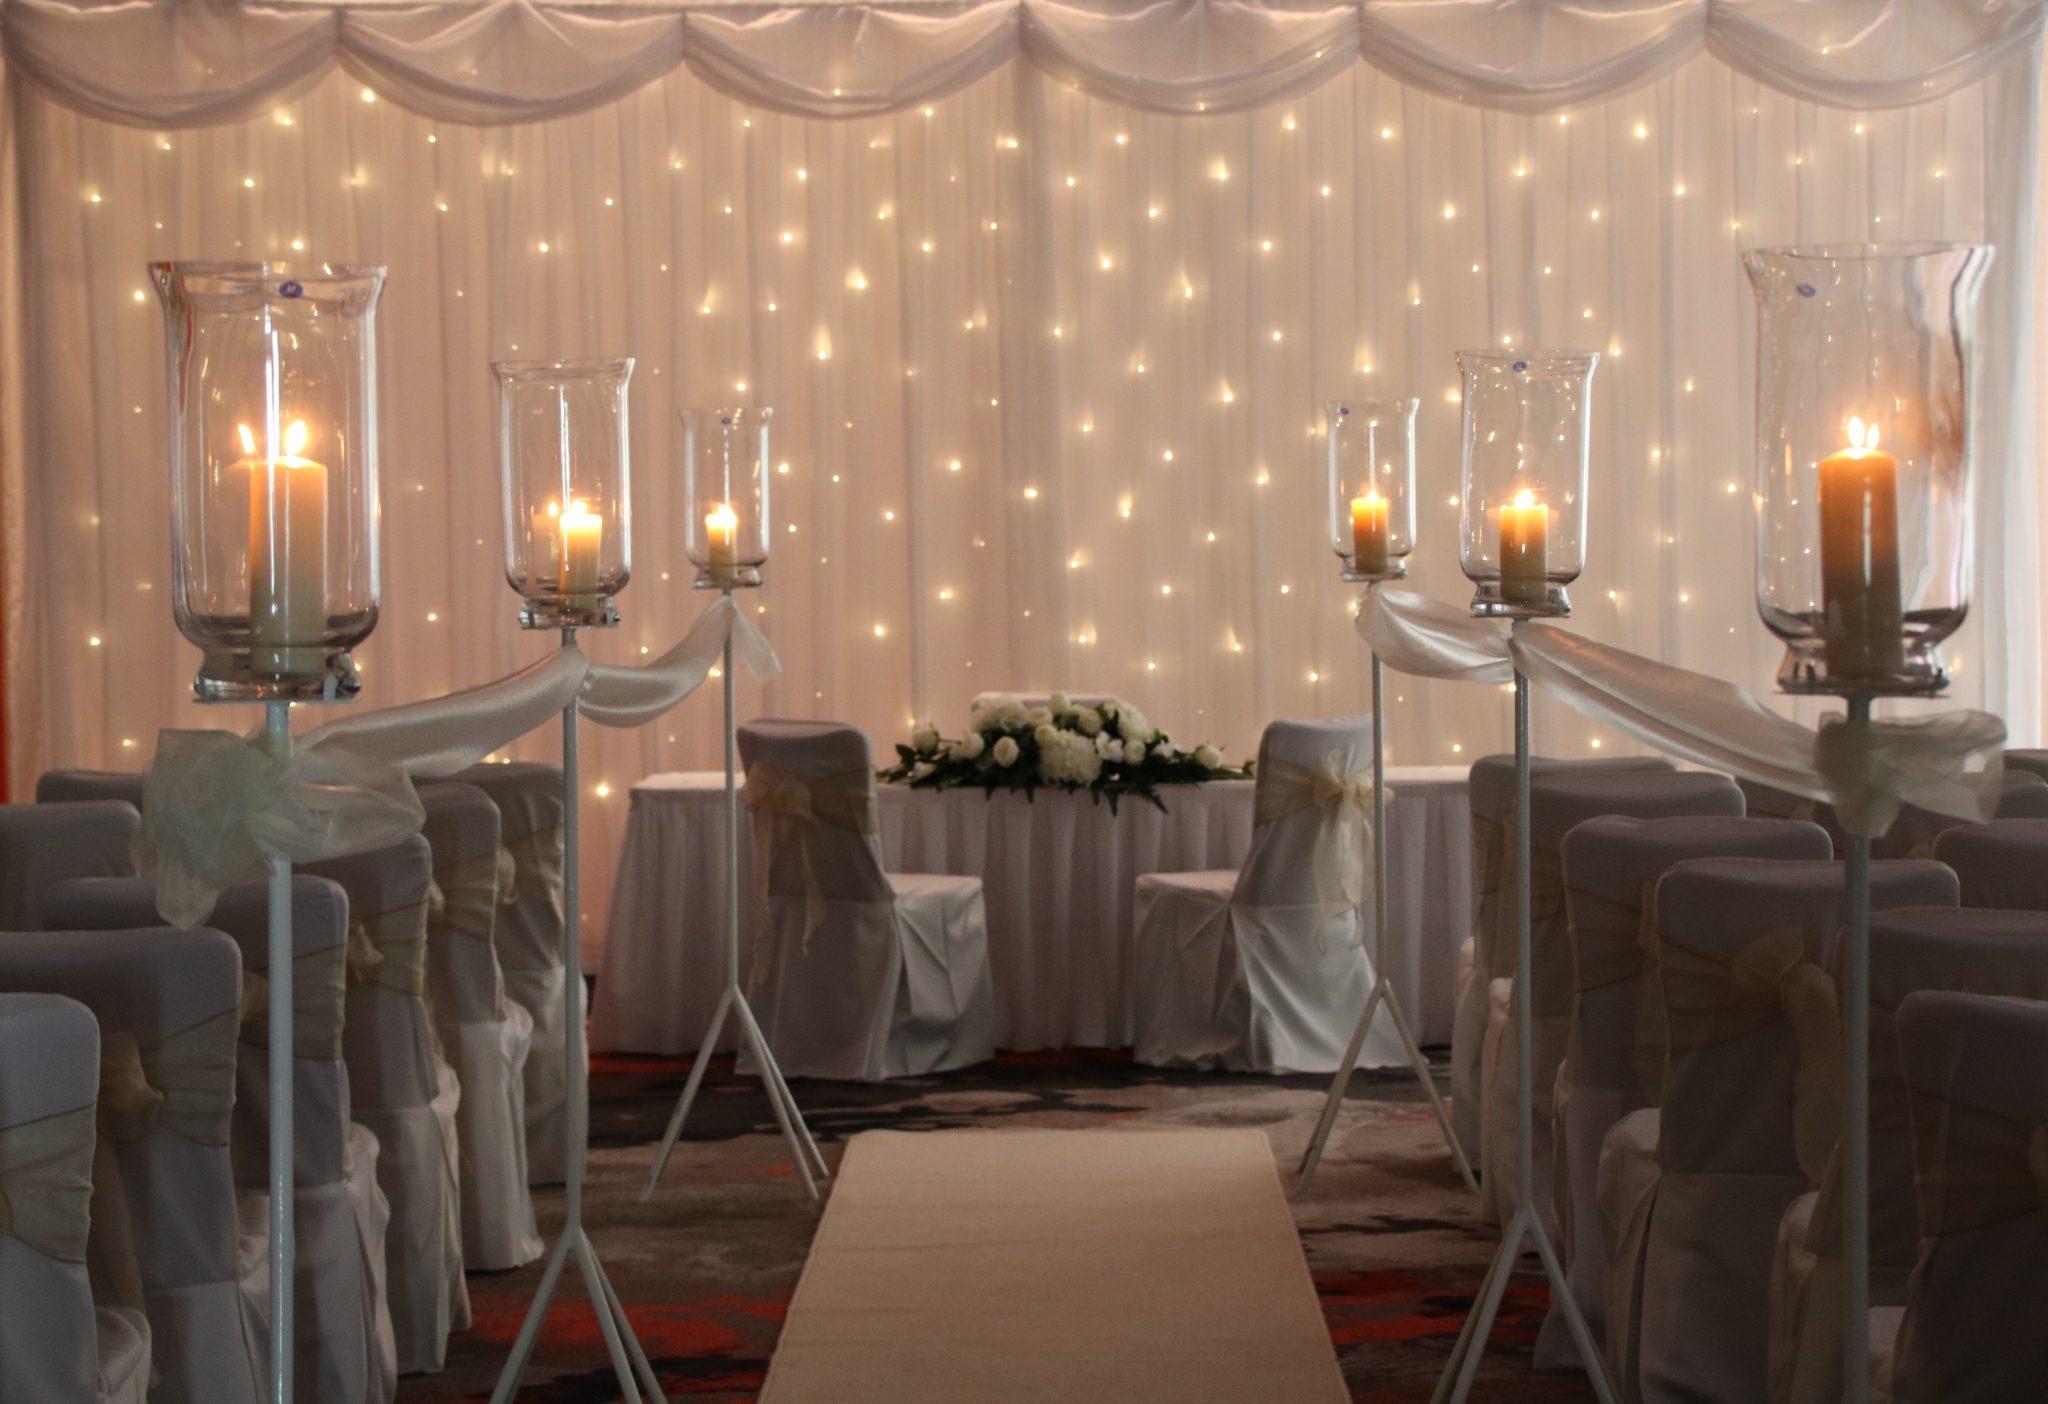 Indoor civil ceremony in wexford